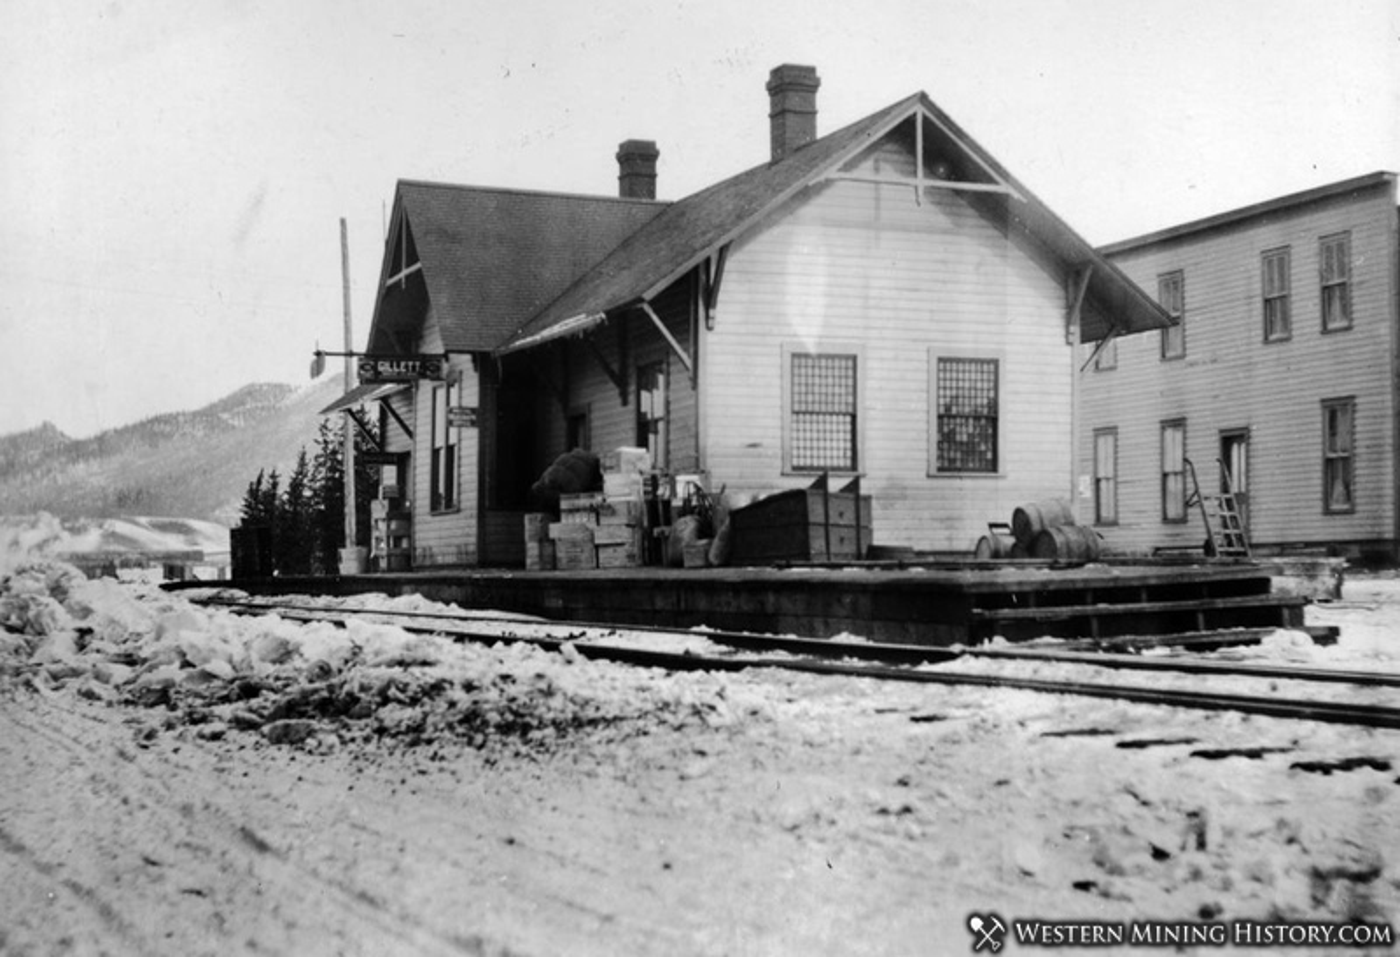 Midland Terminal Railroad Station Gillette Colorado